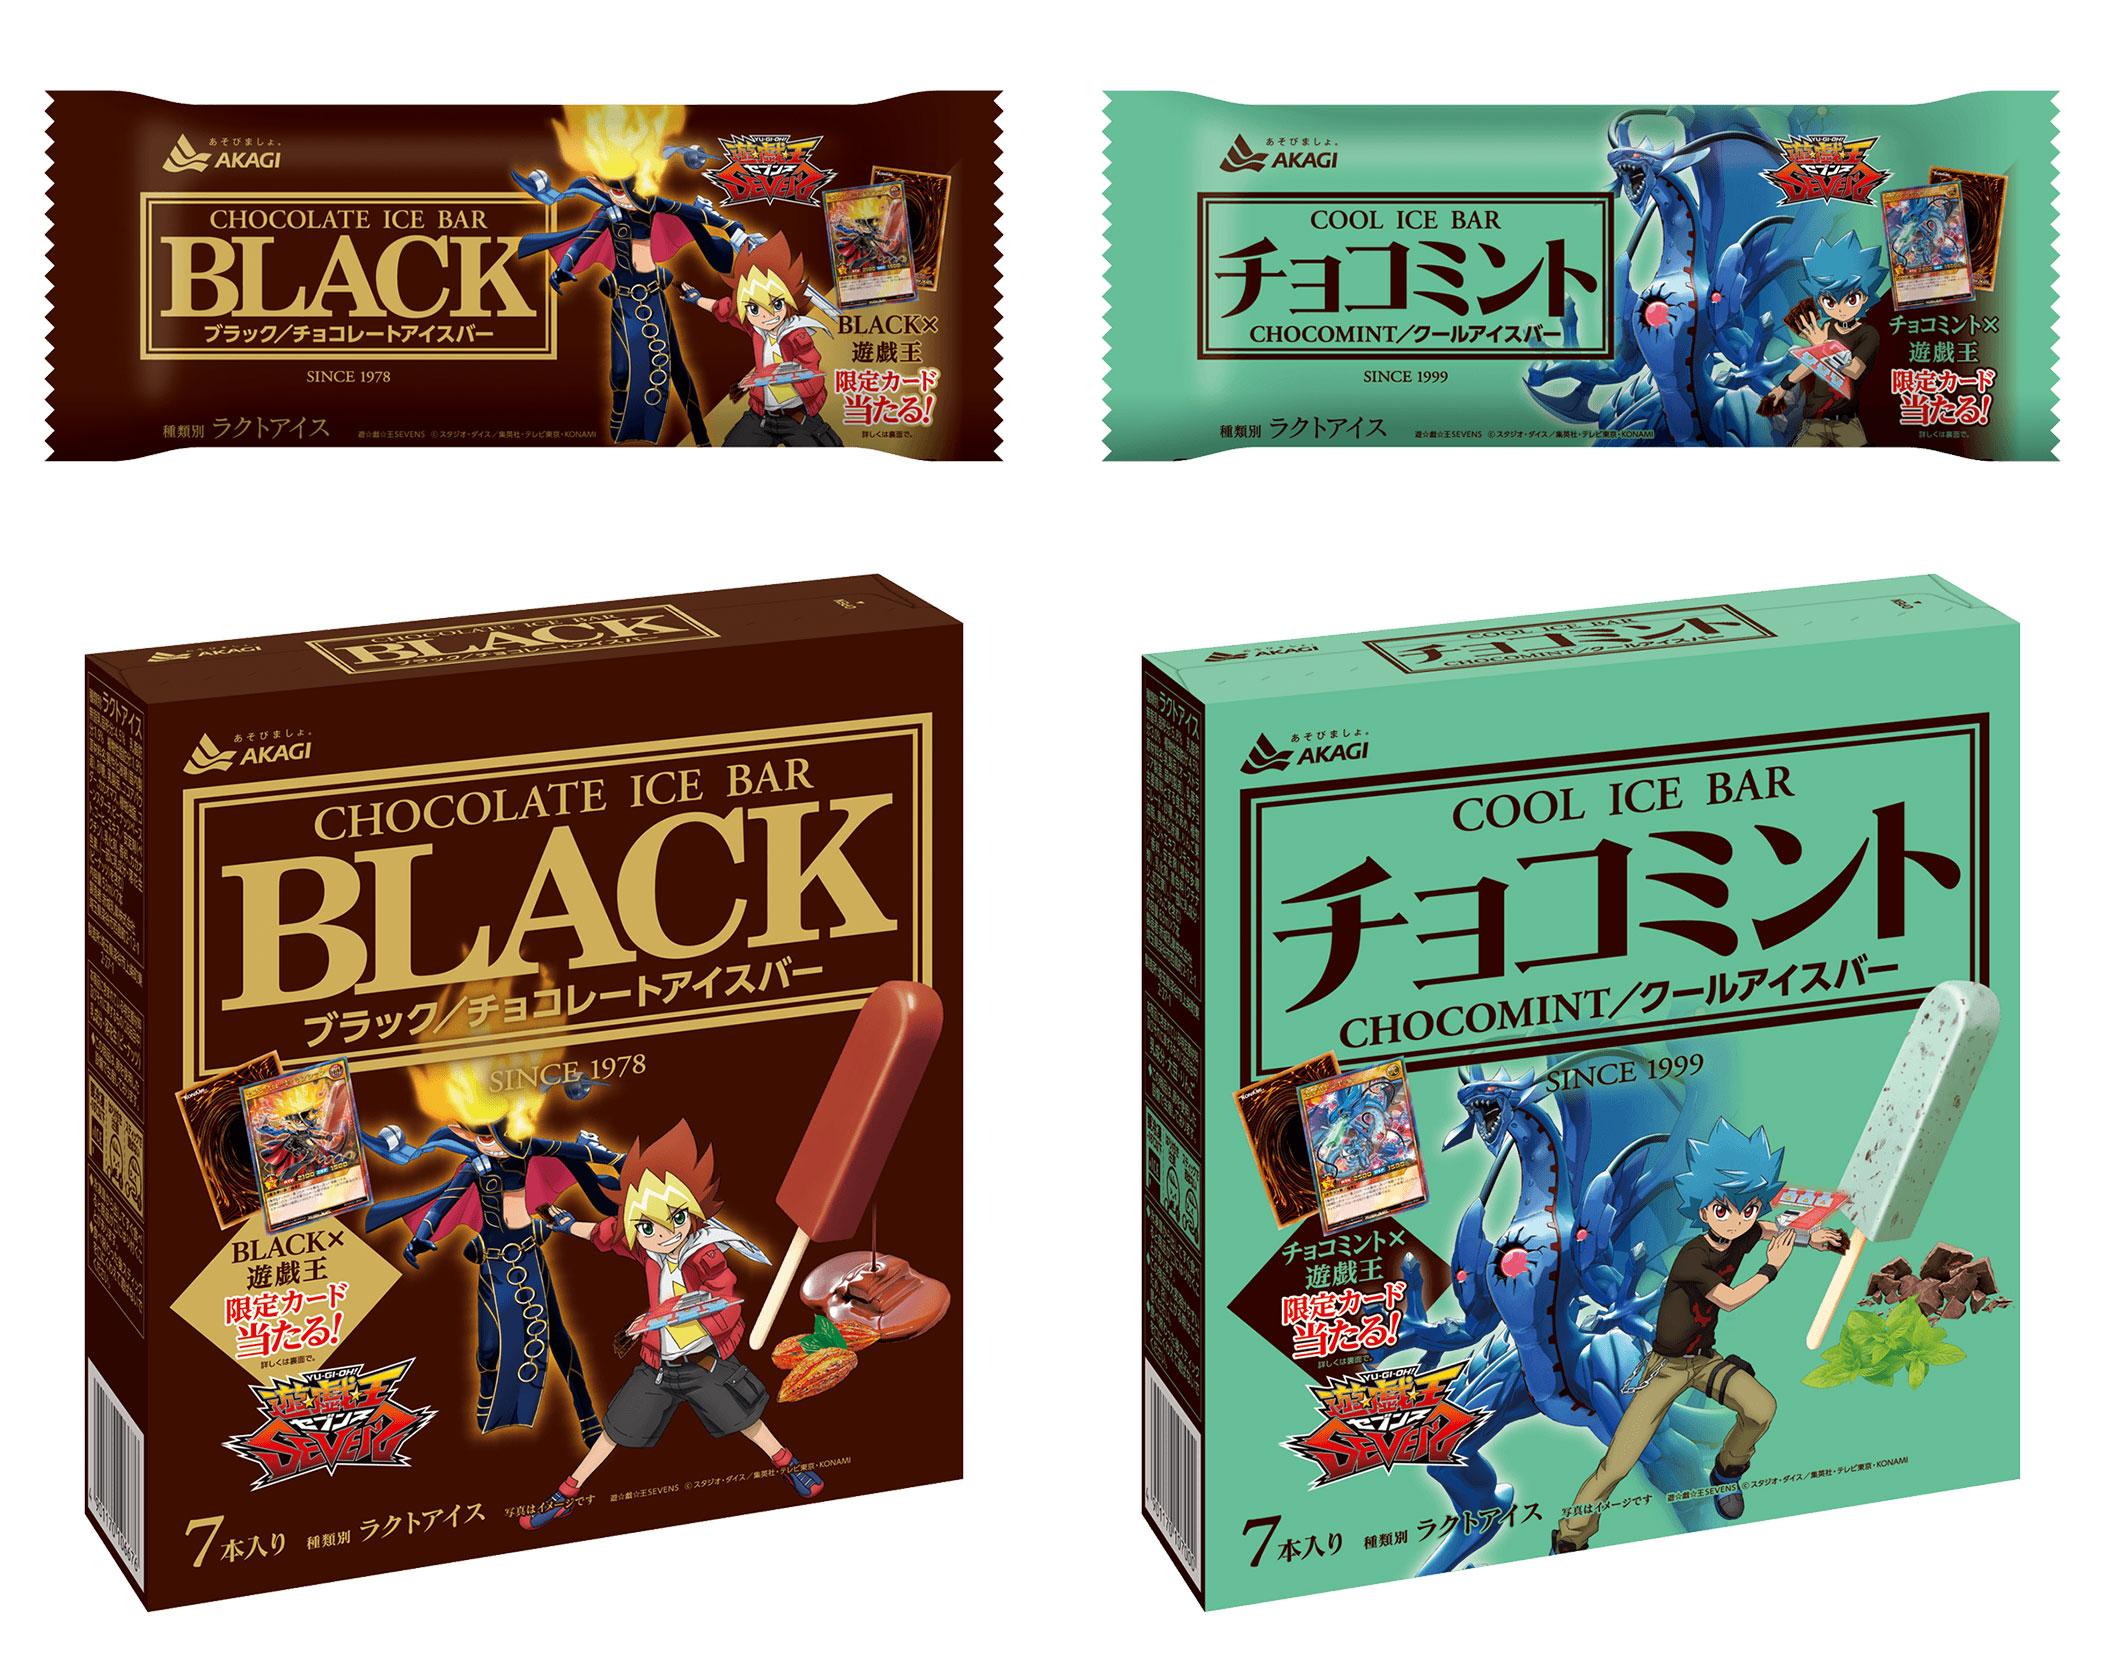 BLACK チョコミントアイス 遊戯王懸賞キャンペーン2021 対象商品